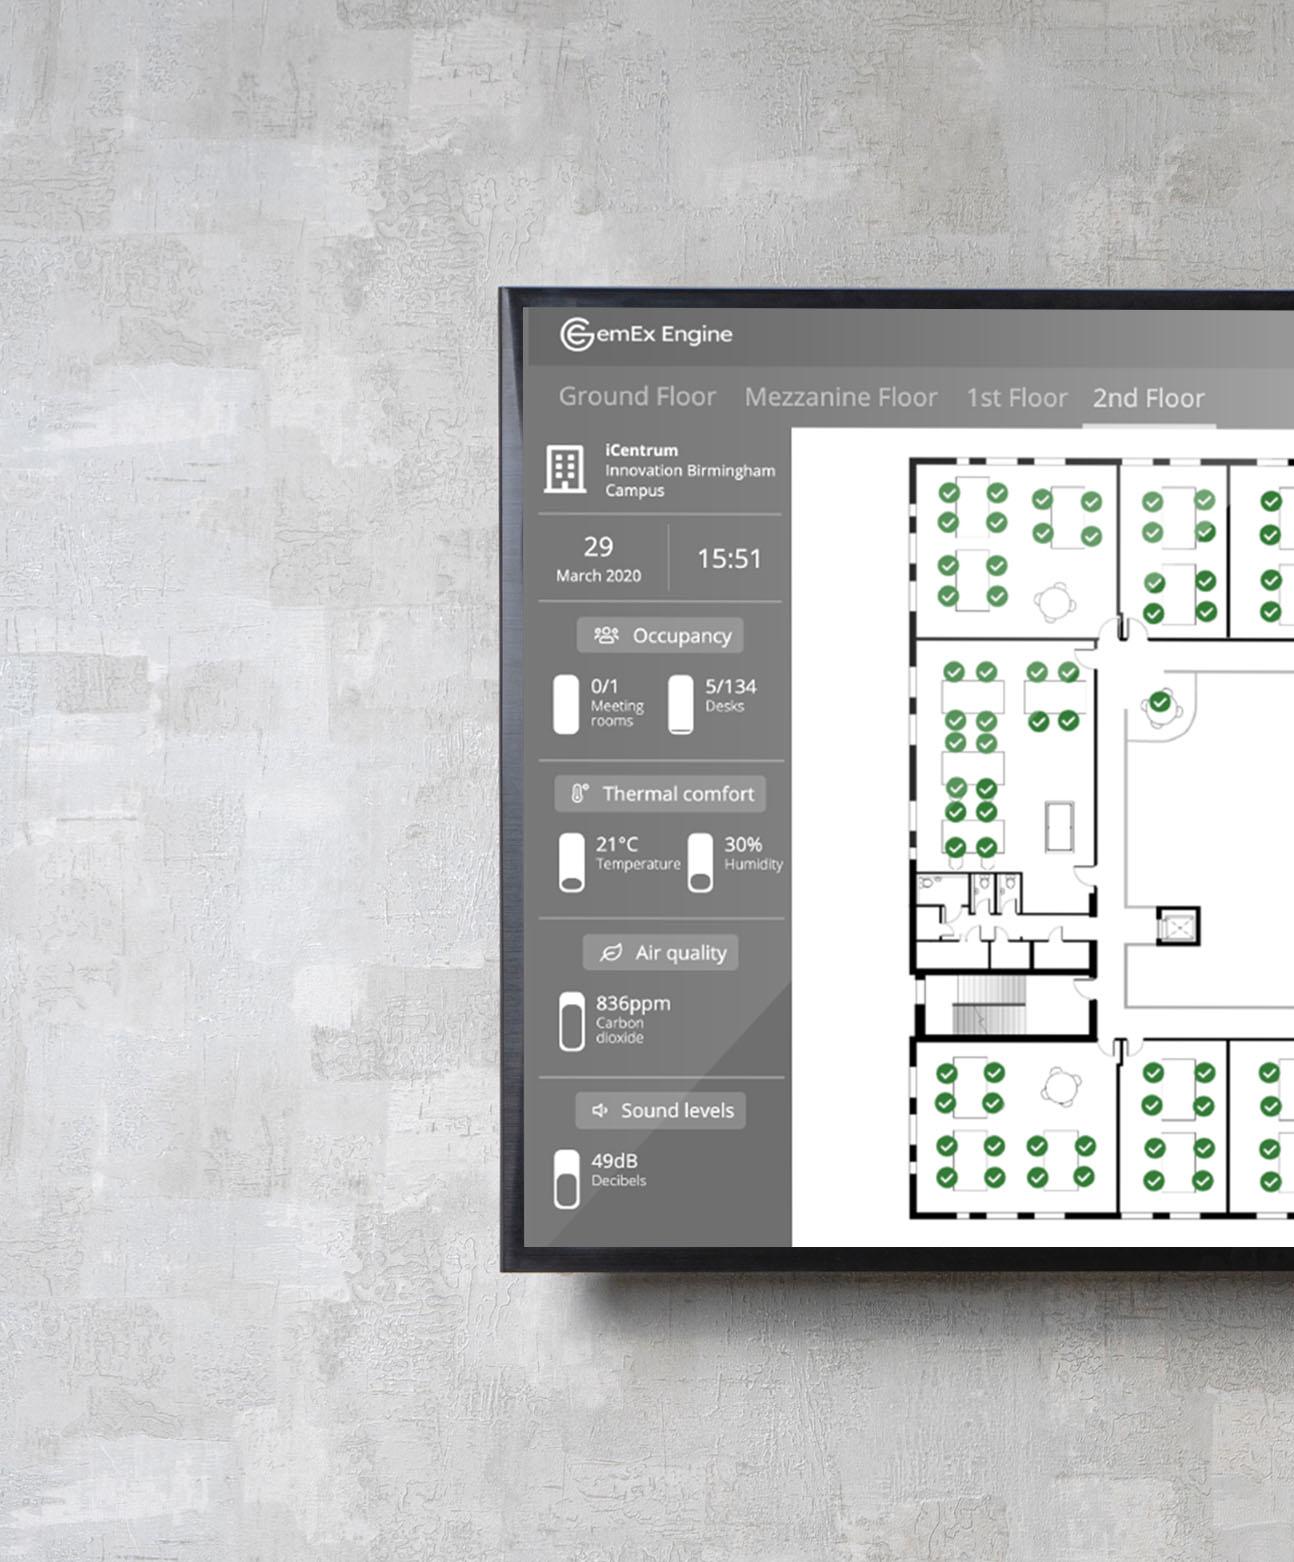 TV & Kiosk View - Desk Availability, Environment Monitoring